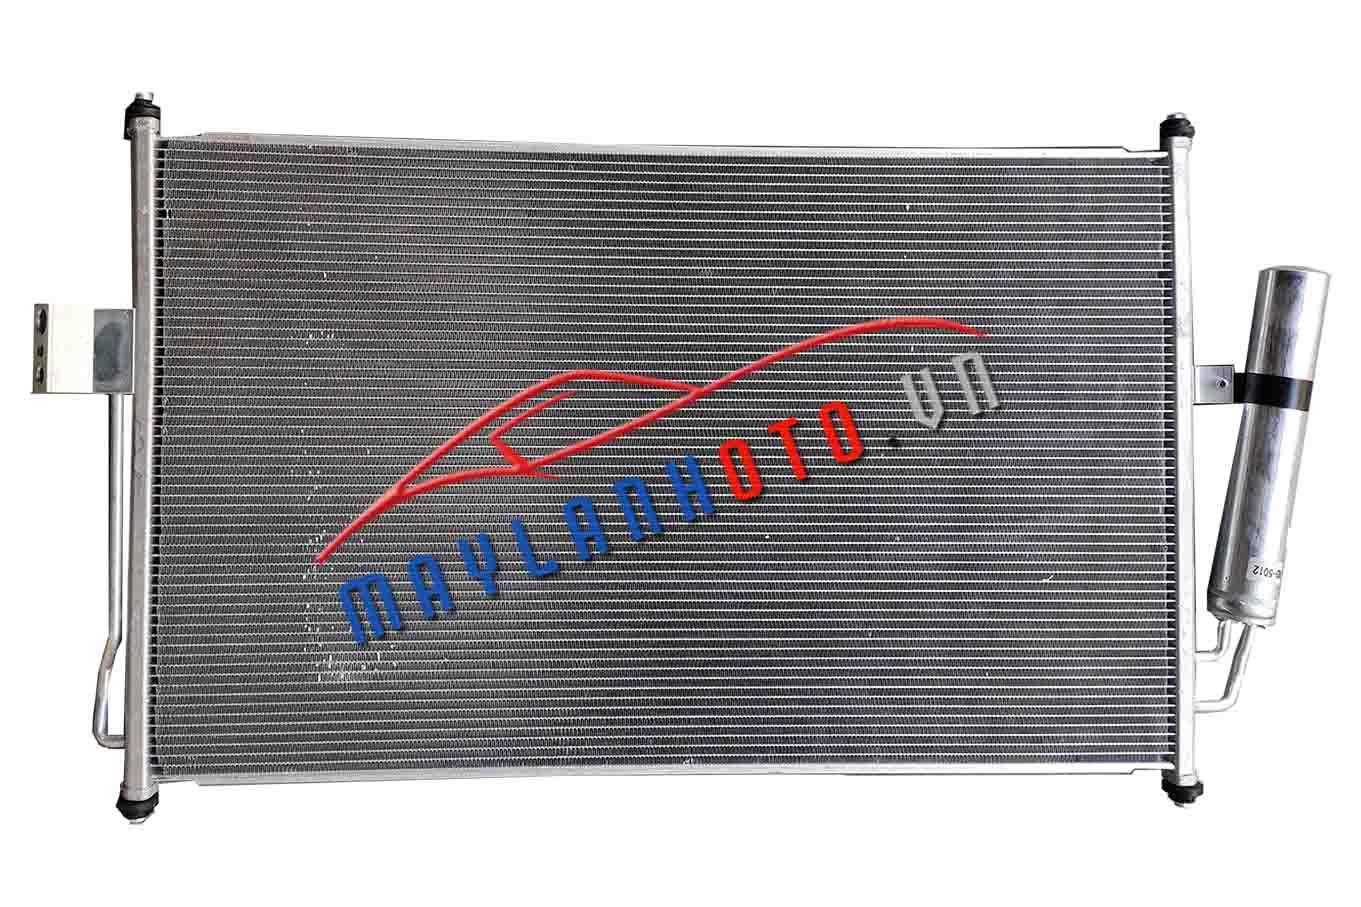 Colorado / Giàn nóng điều hòa Chevrolet Colorado / Dàn nóng điều hòa Chevrolet Colorado